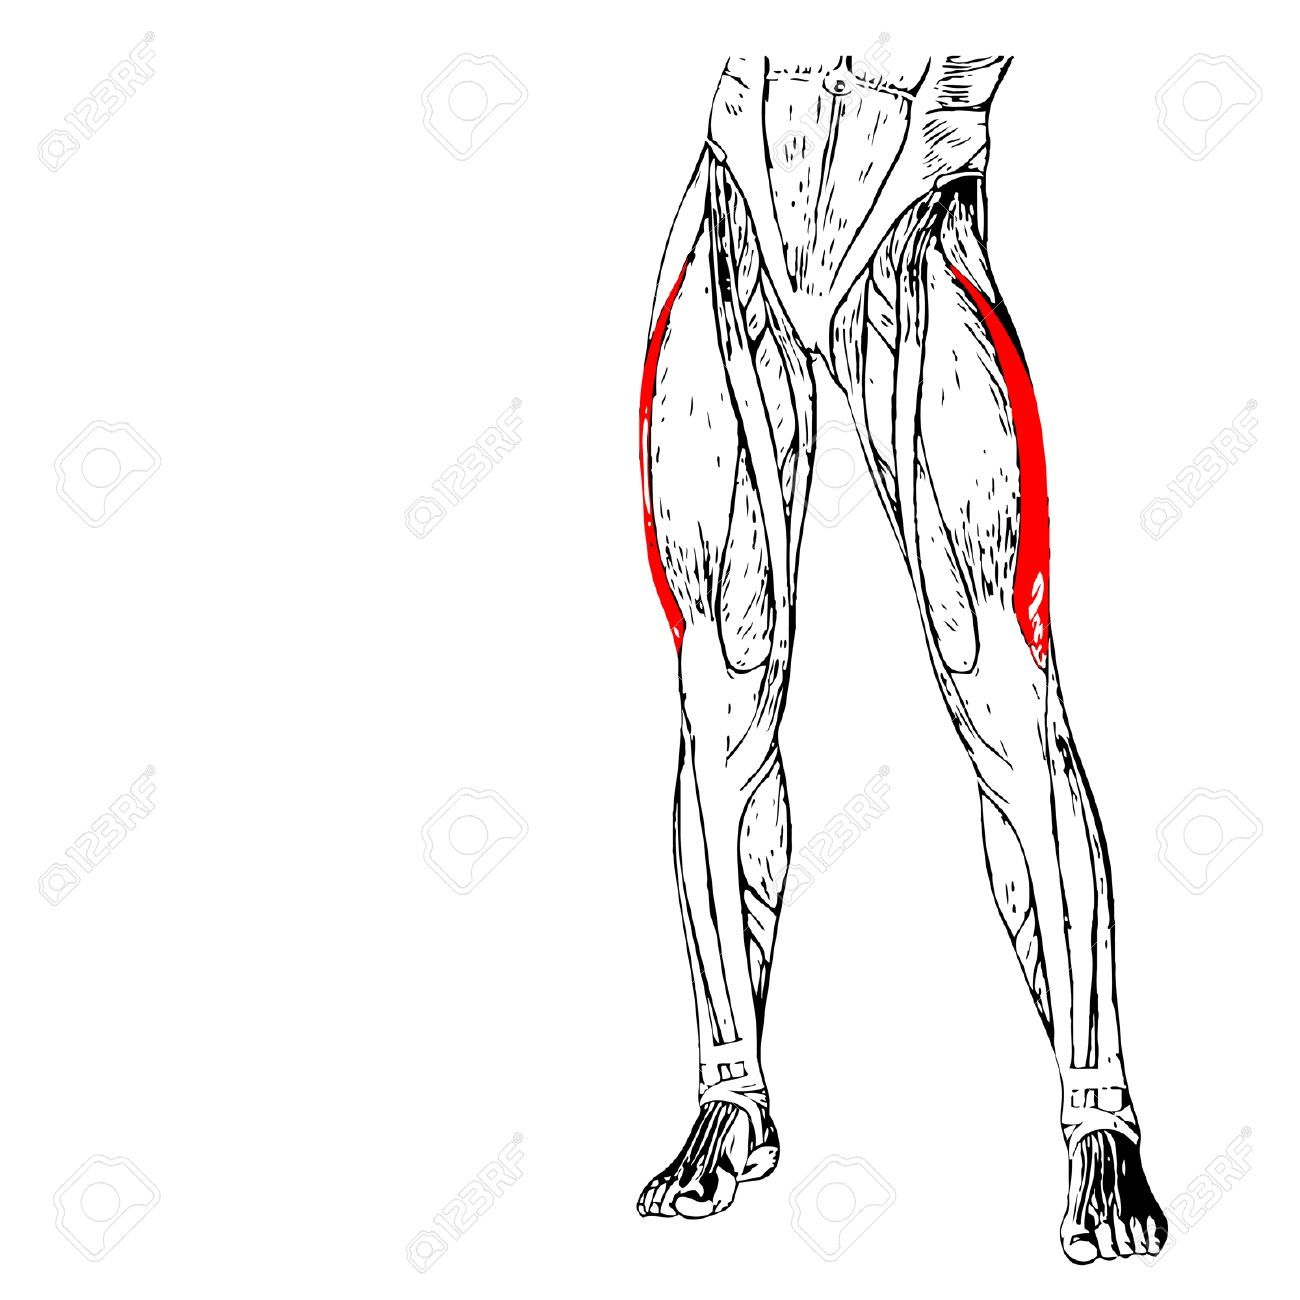 Aductor Largo Concepto 3D Anatomía Muslo Humano O Muscular Anatómica ...